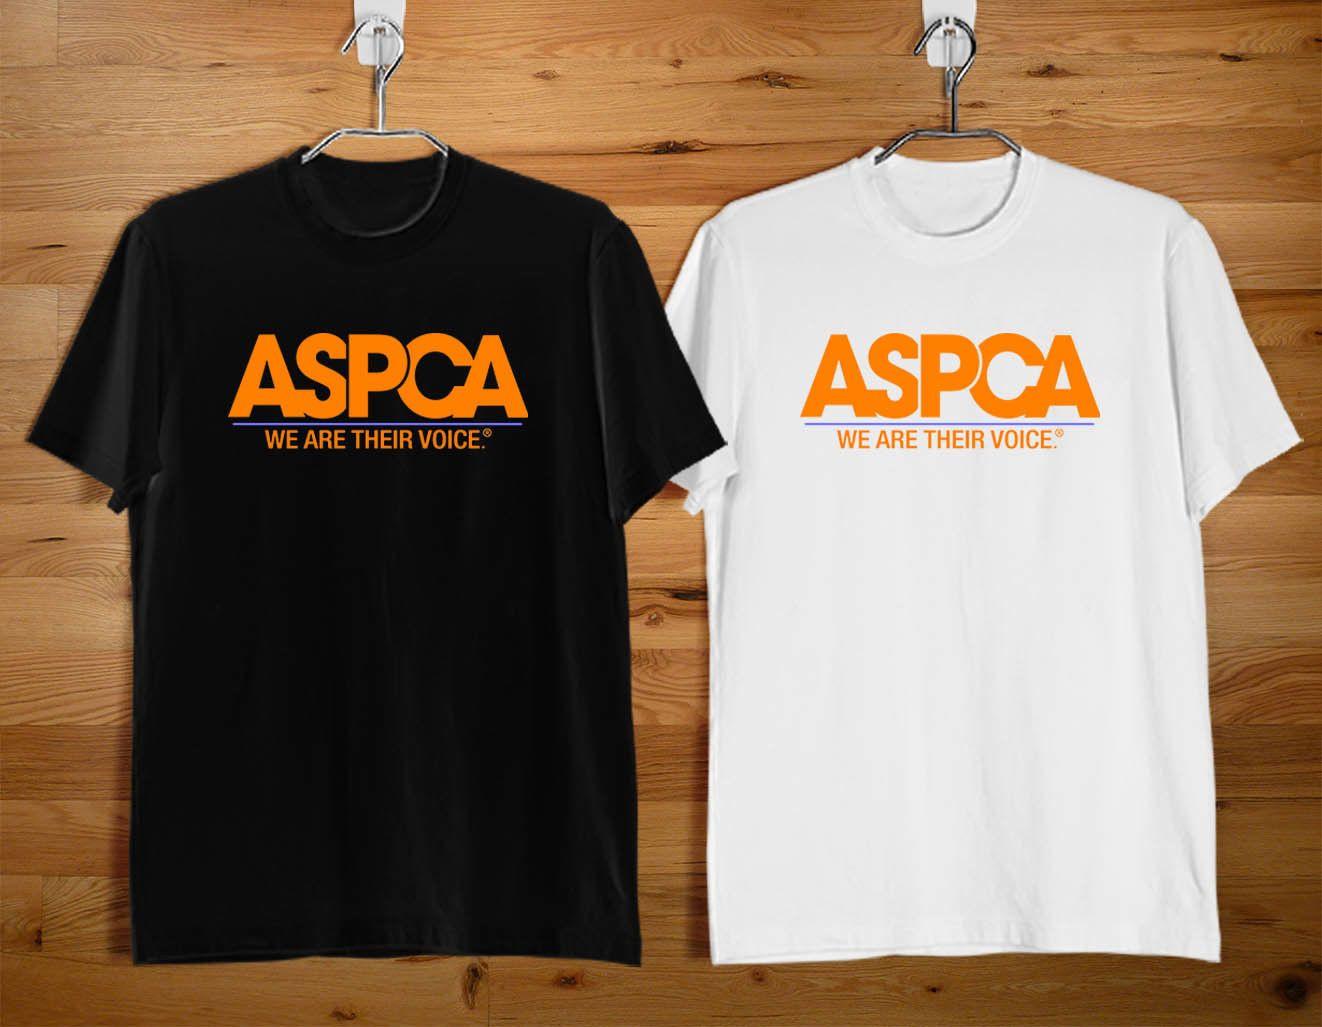 f1e764af05f9dd ASPCA New Design Black And White T Shirt Hilarious T Shirts Designer T Shirt  From Lanshiren4